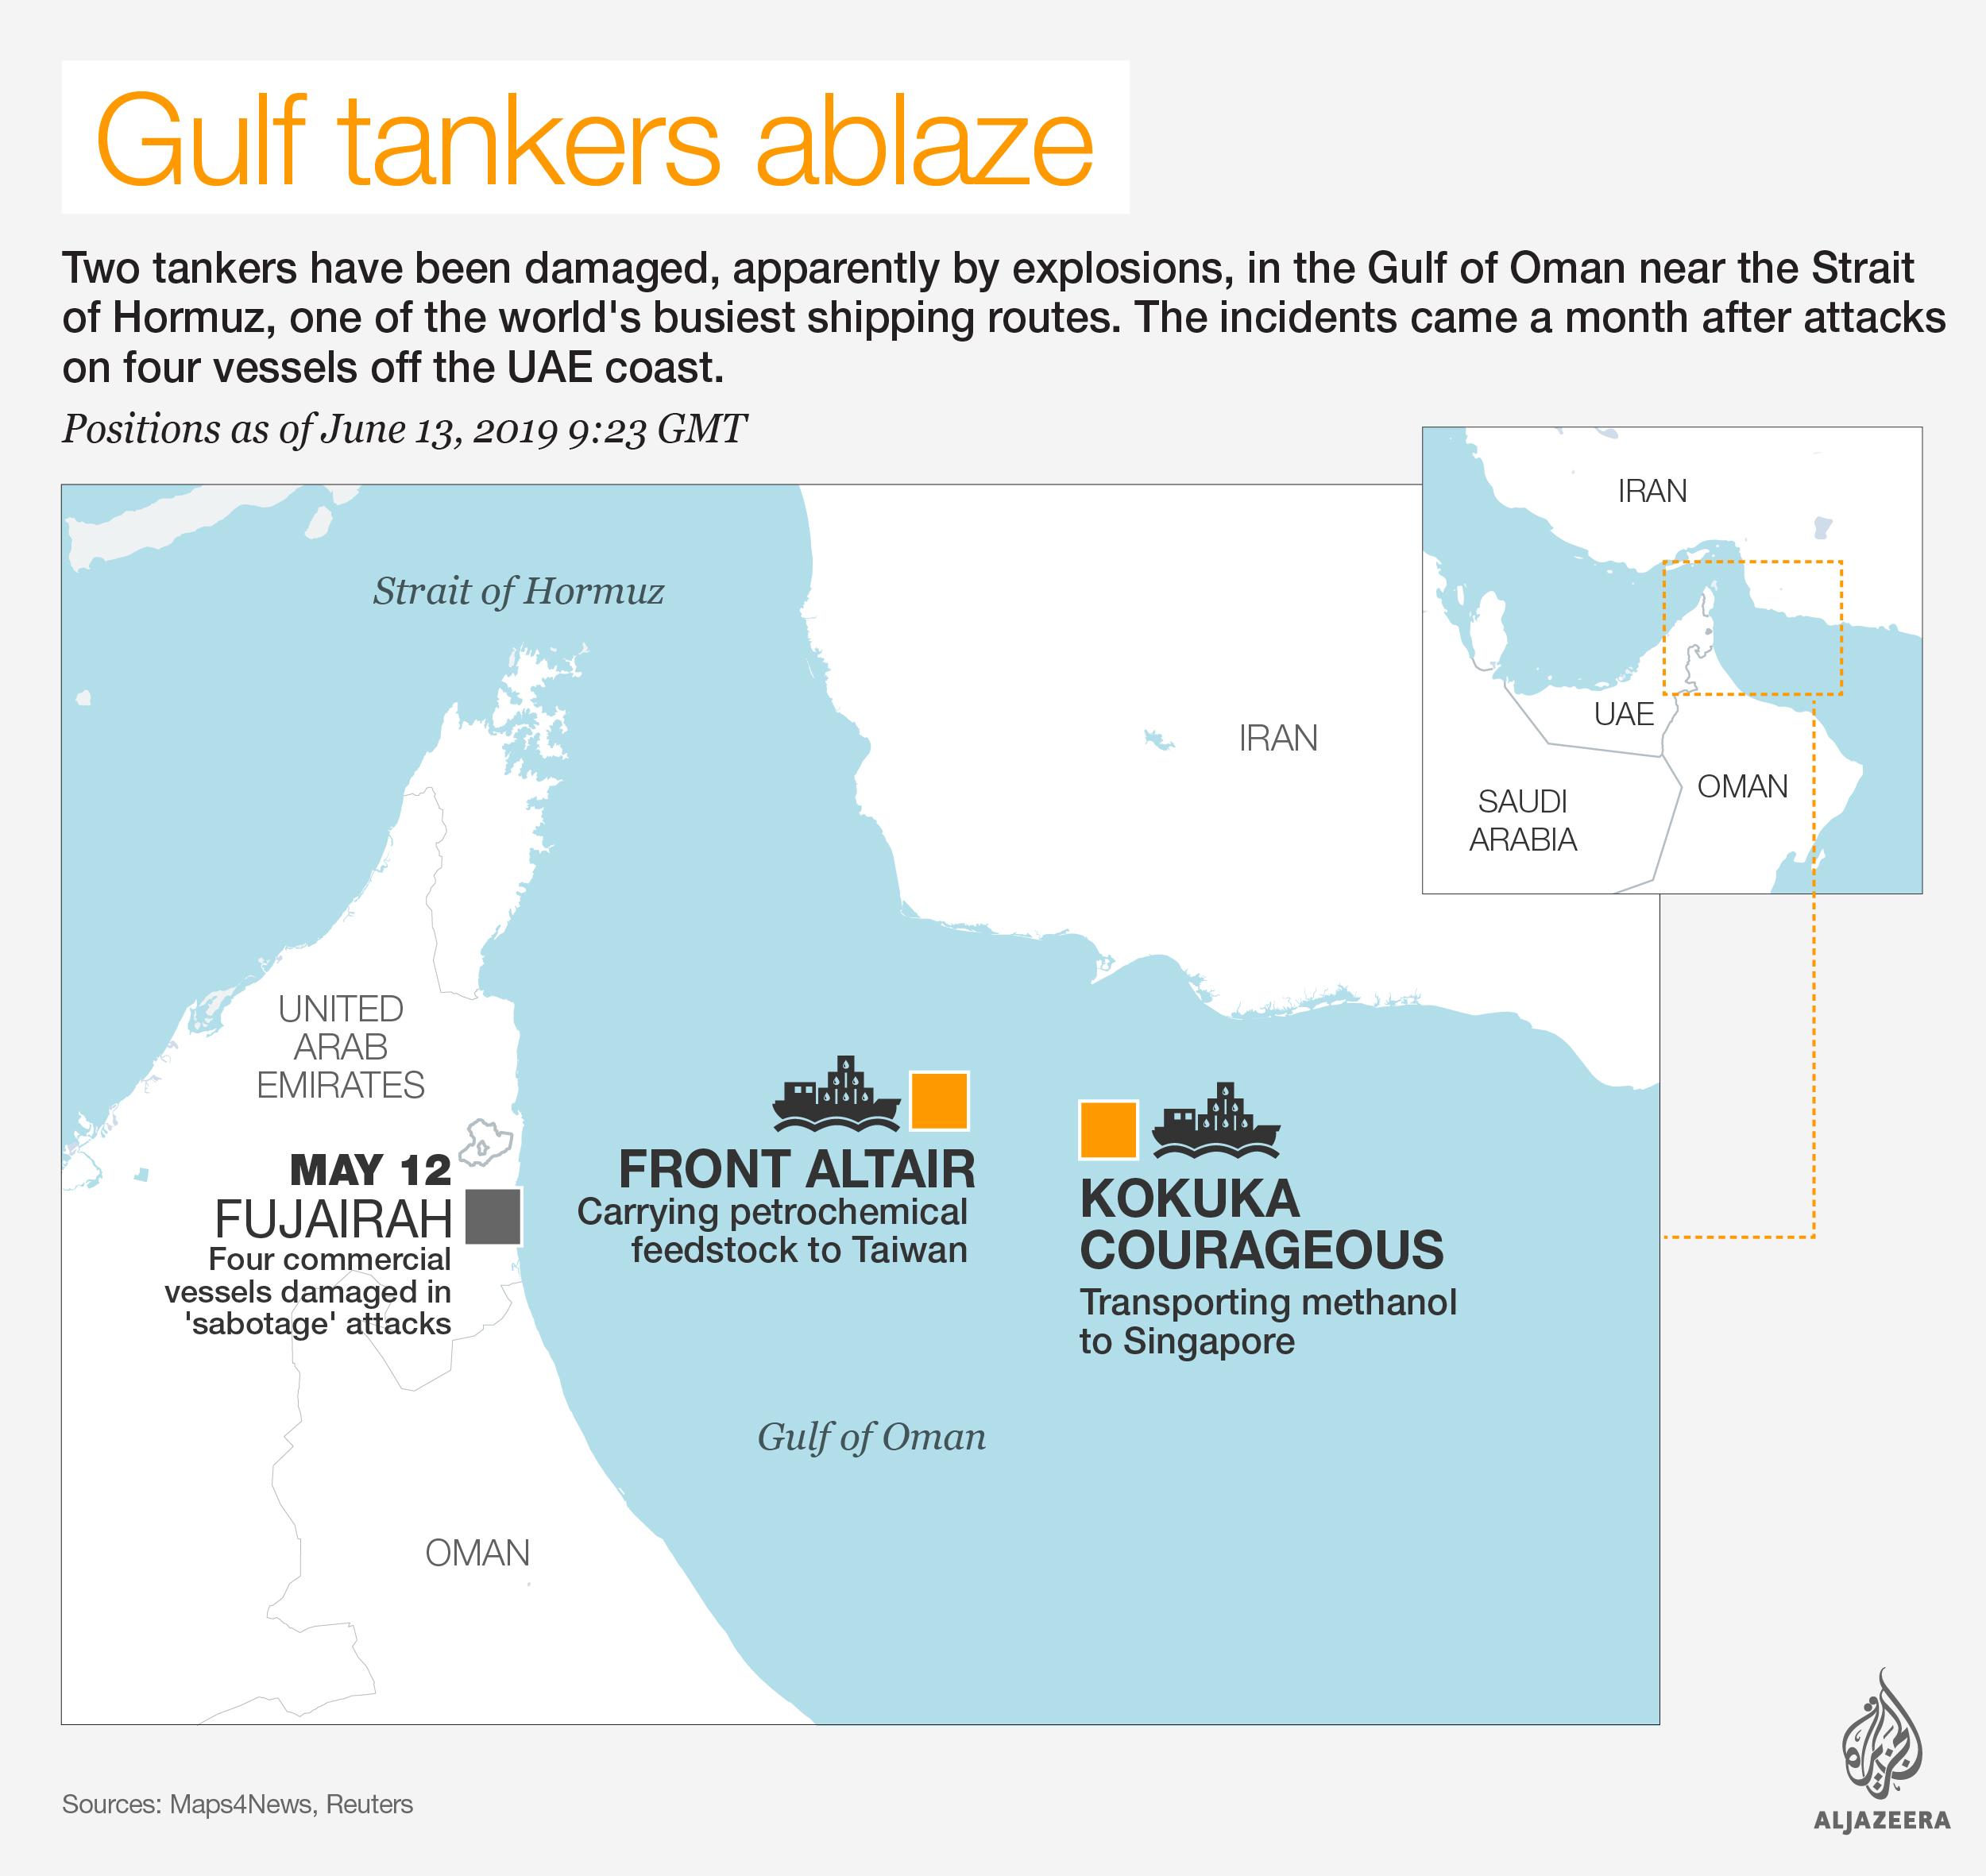 INTERACTIVE: Gulf of Oman - oil tankers ablaze, June 12 2019